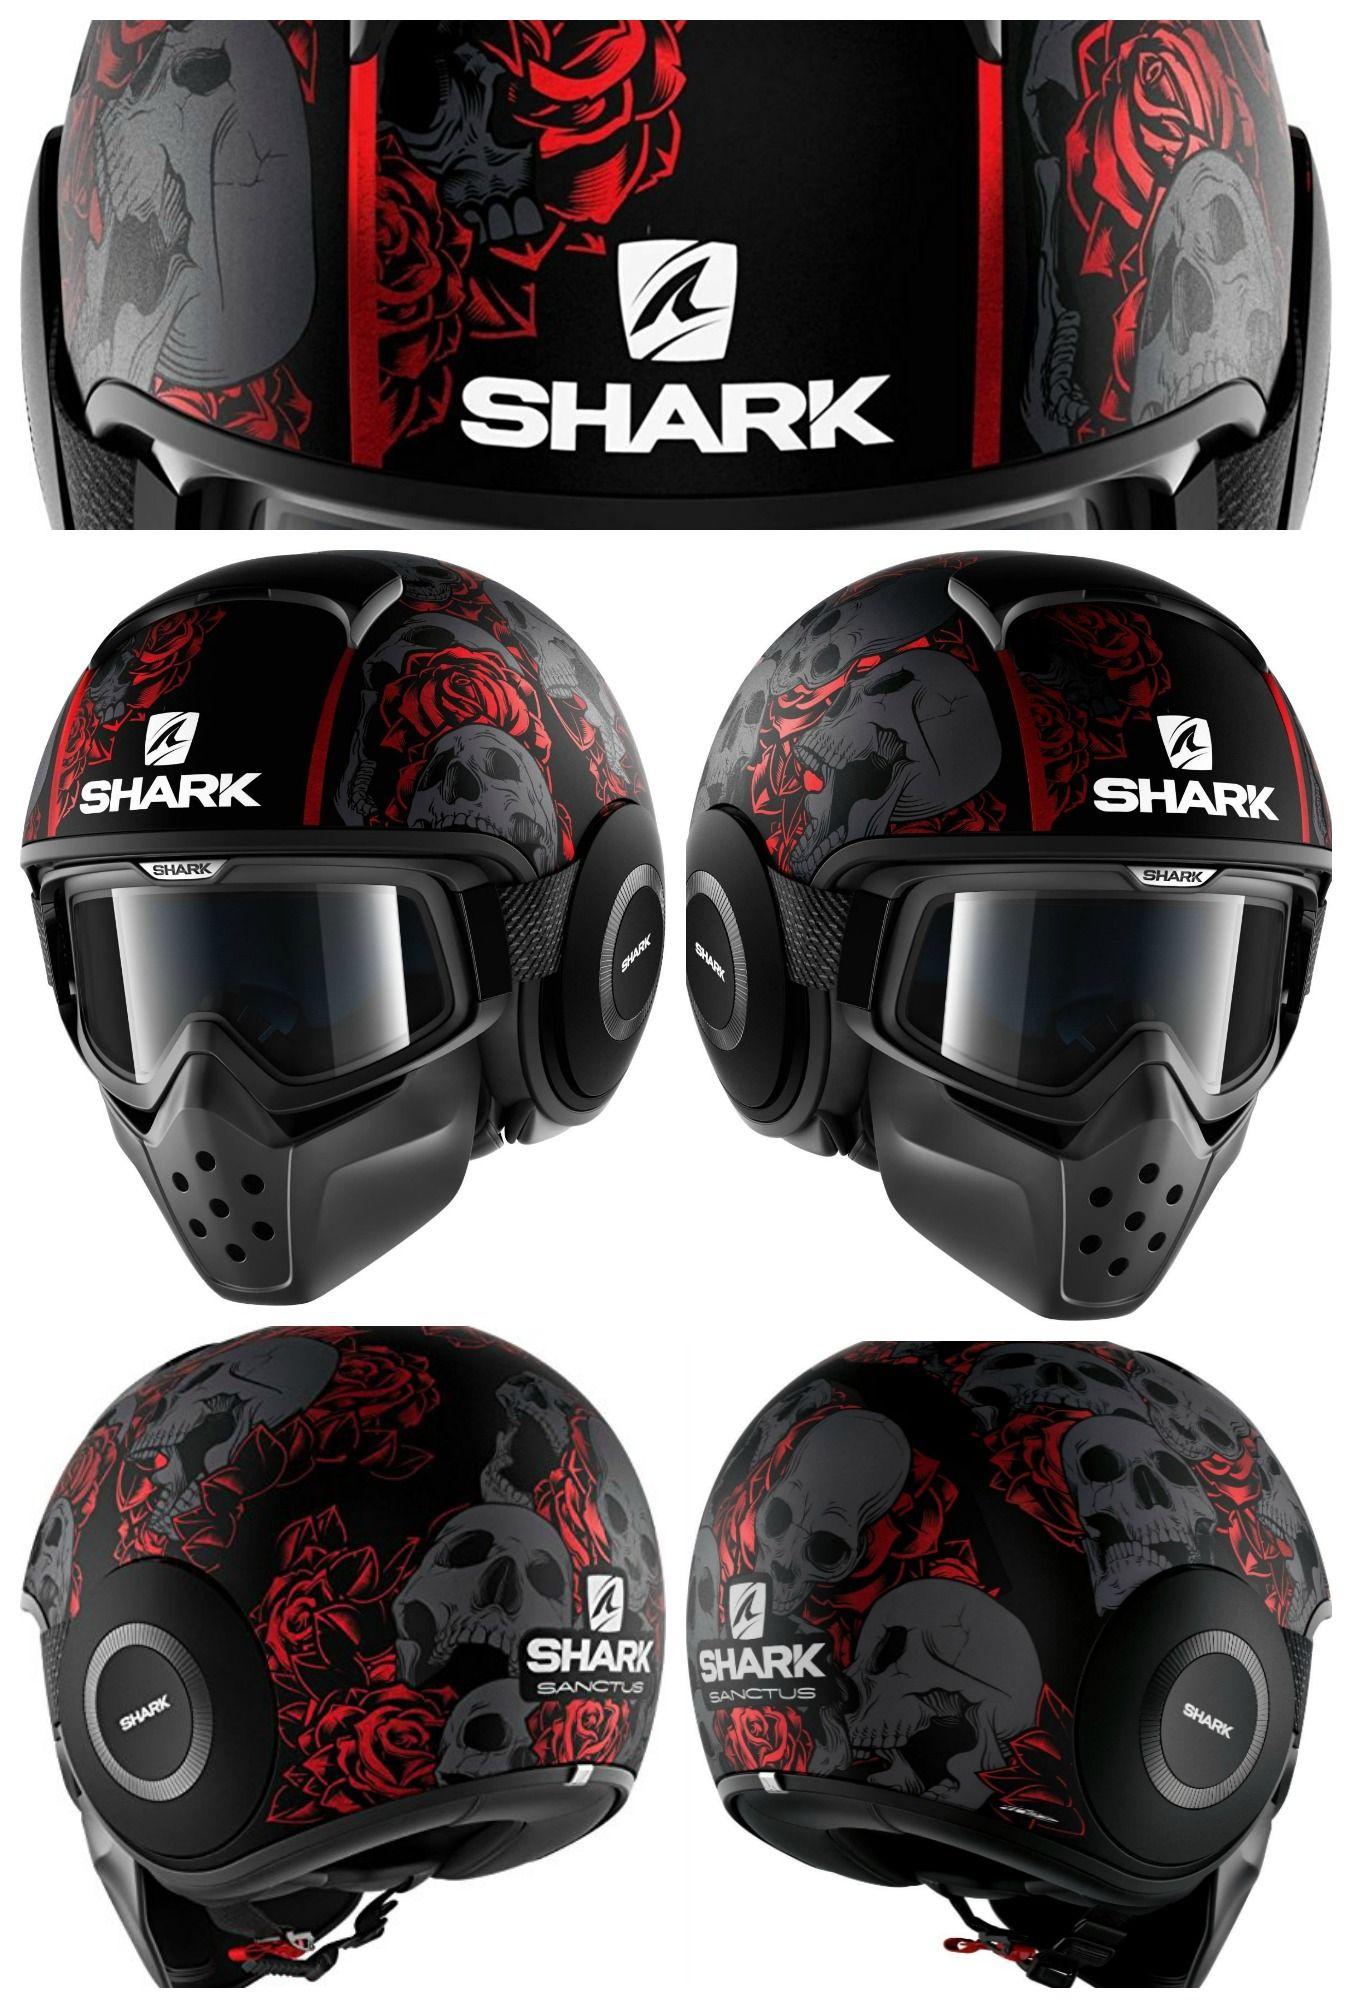 Shark Raw Helmet Review A Hybrid Helmet Motorcycle Helmets With